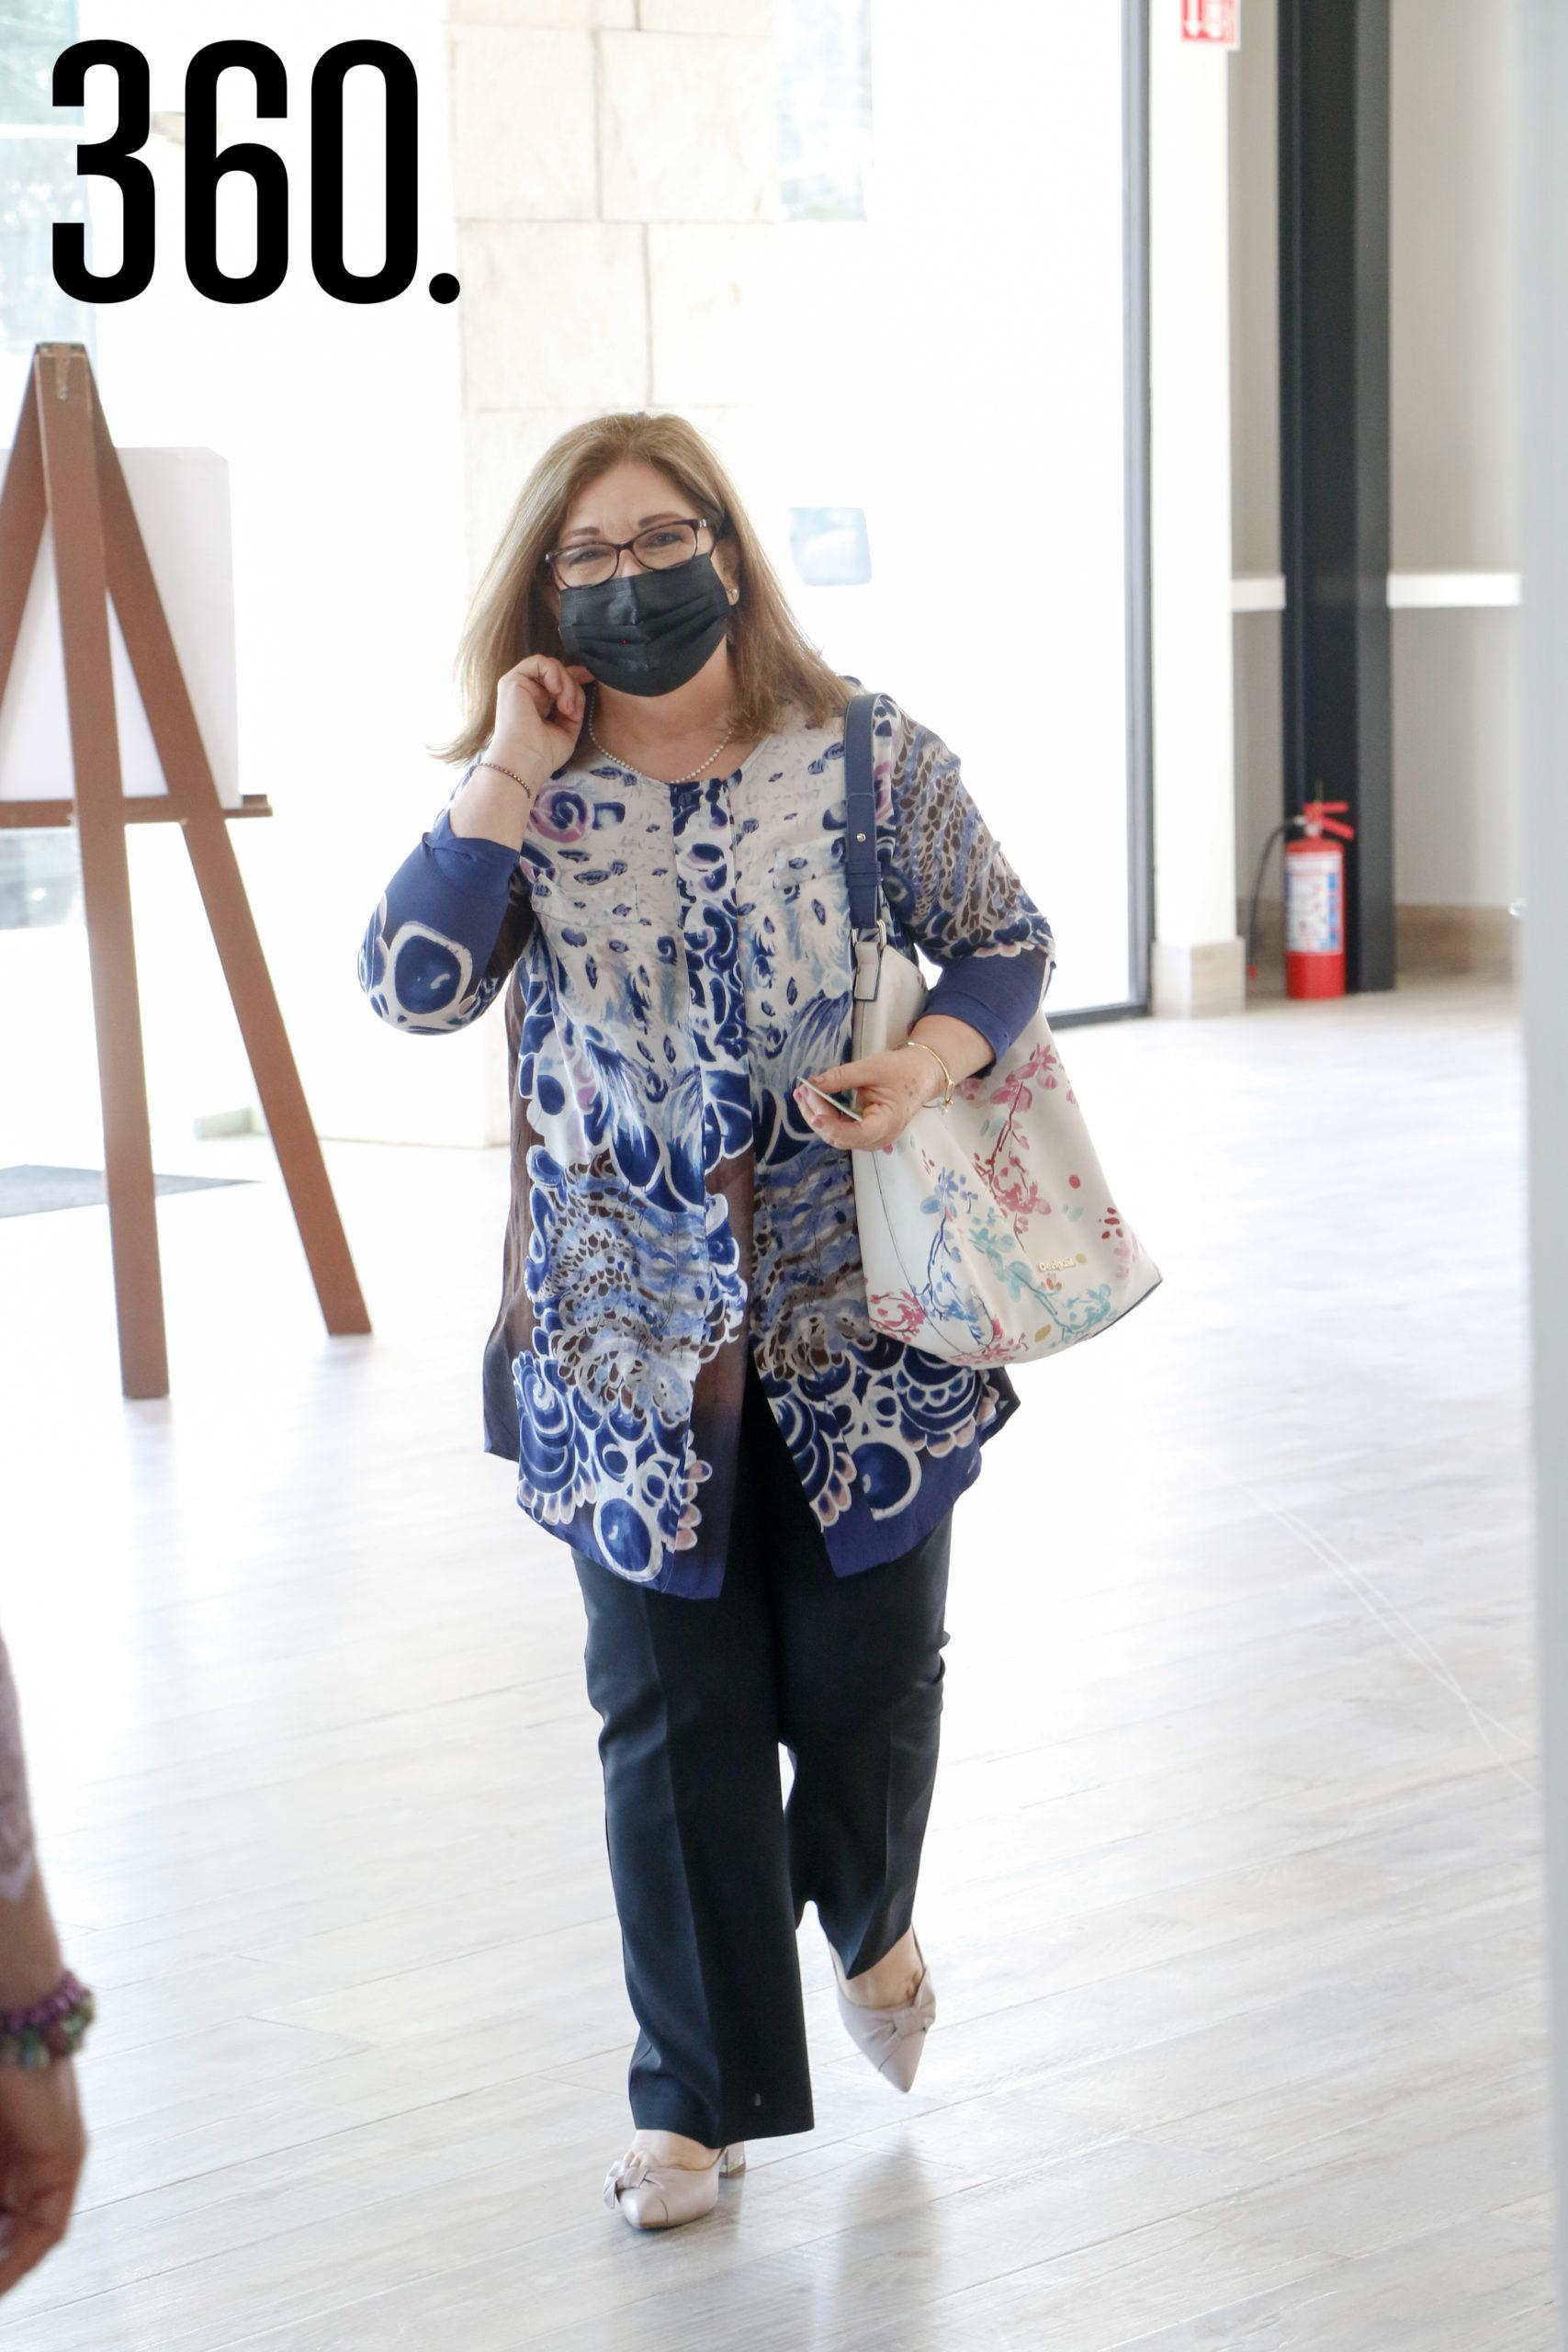 Anita Navejar.